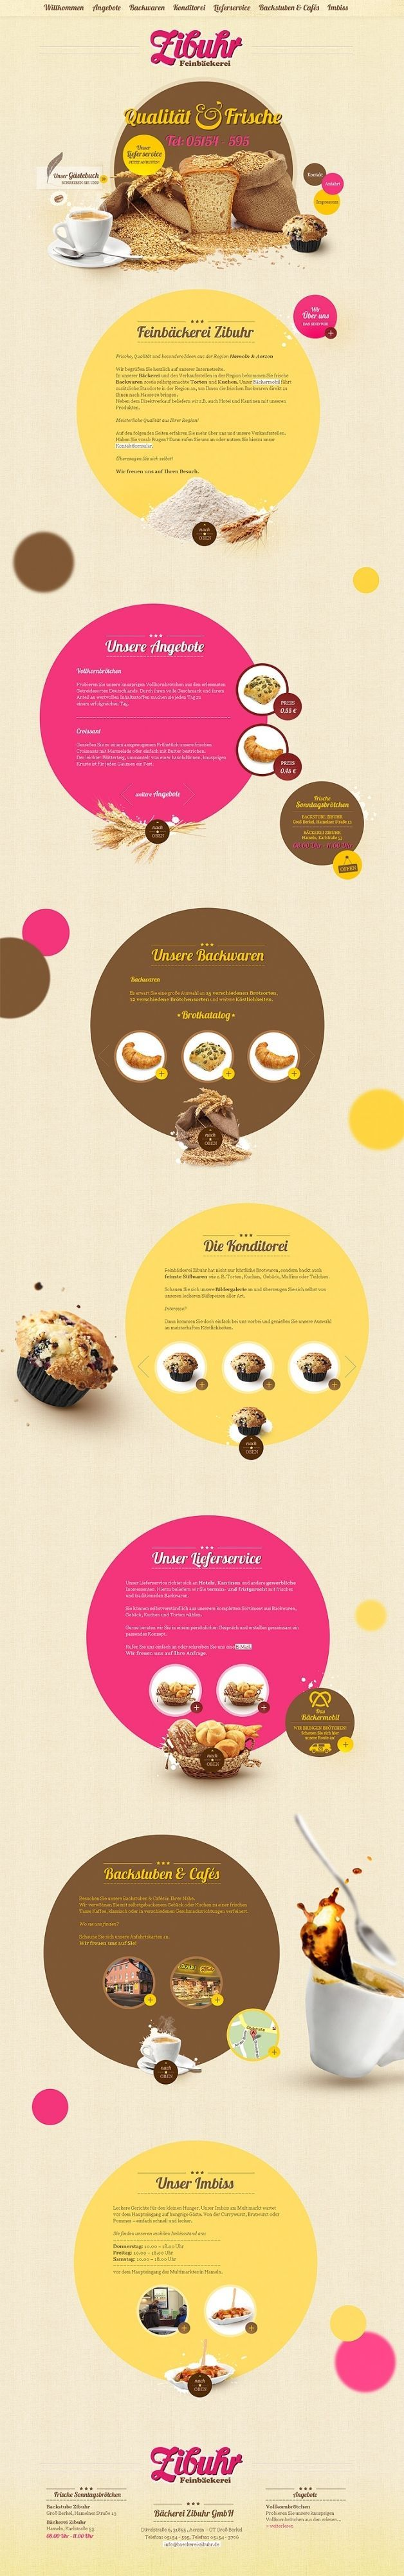 #webdesign #inspiration #bakery #cupcake: